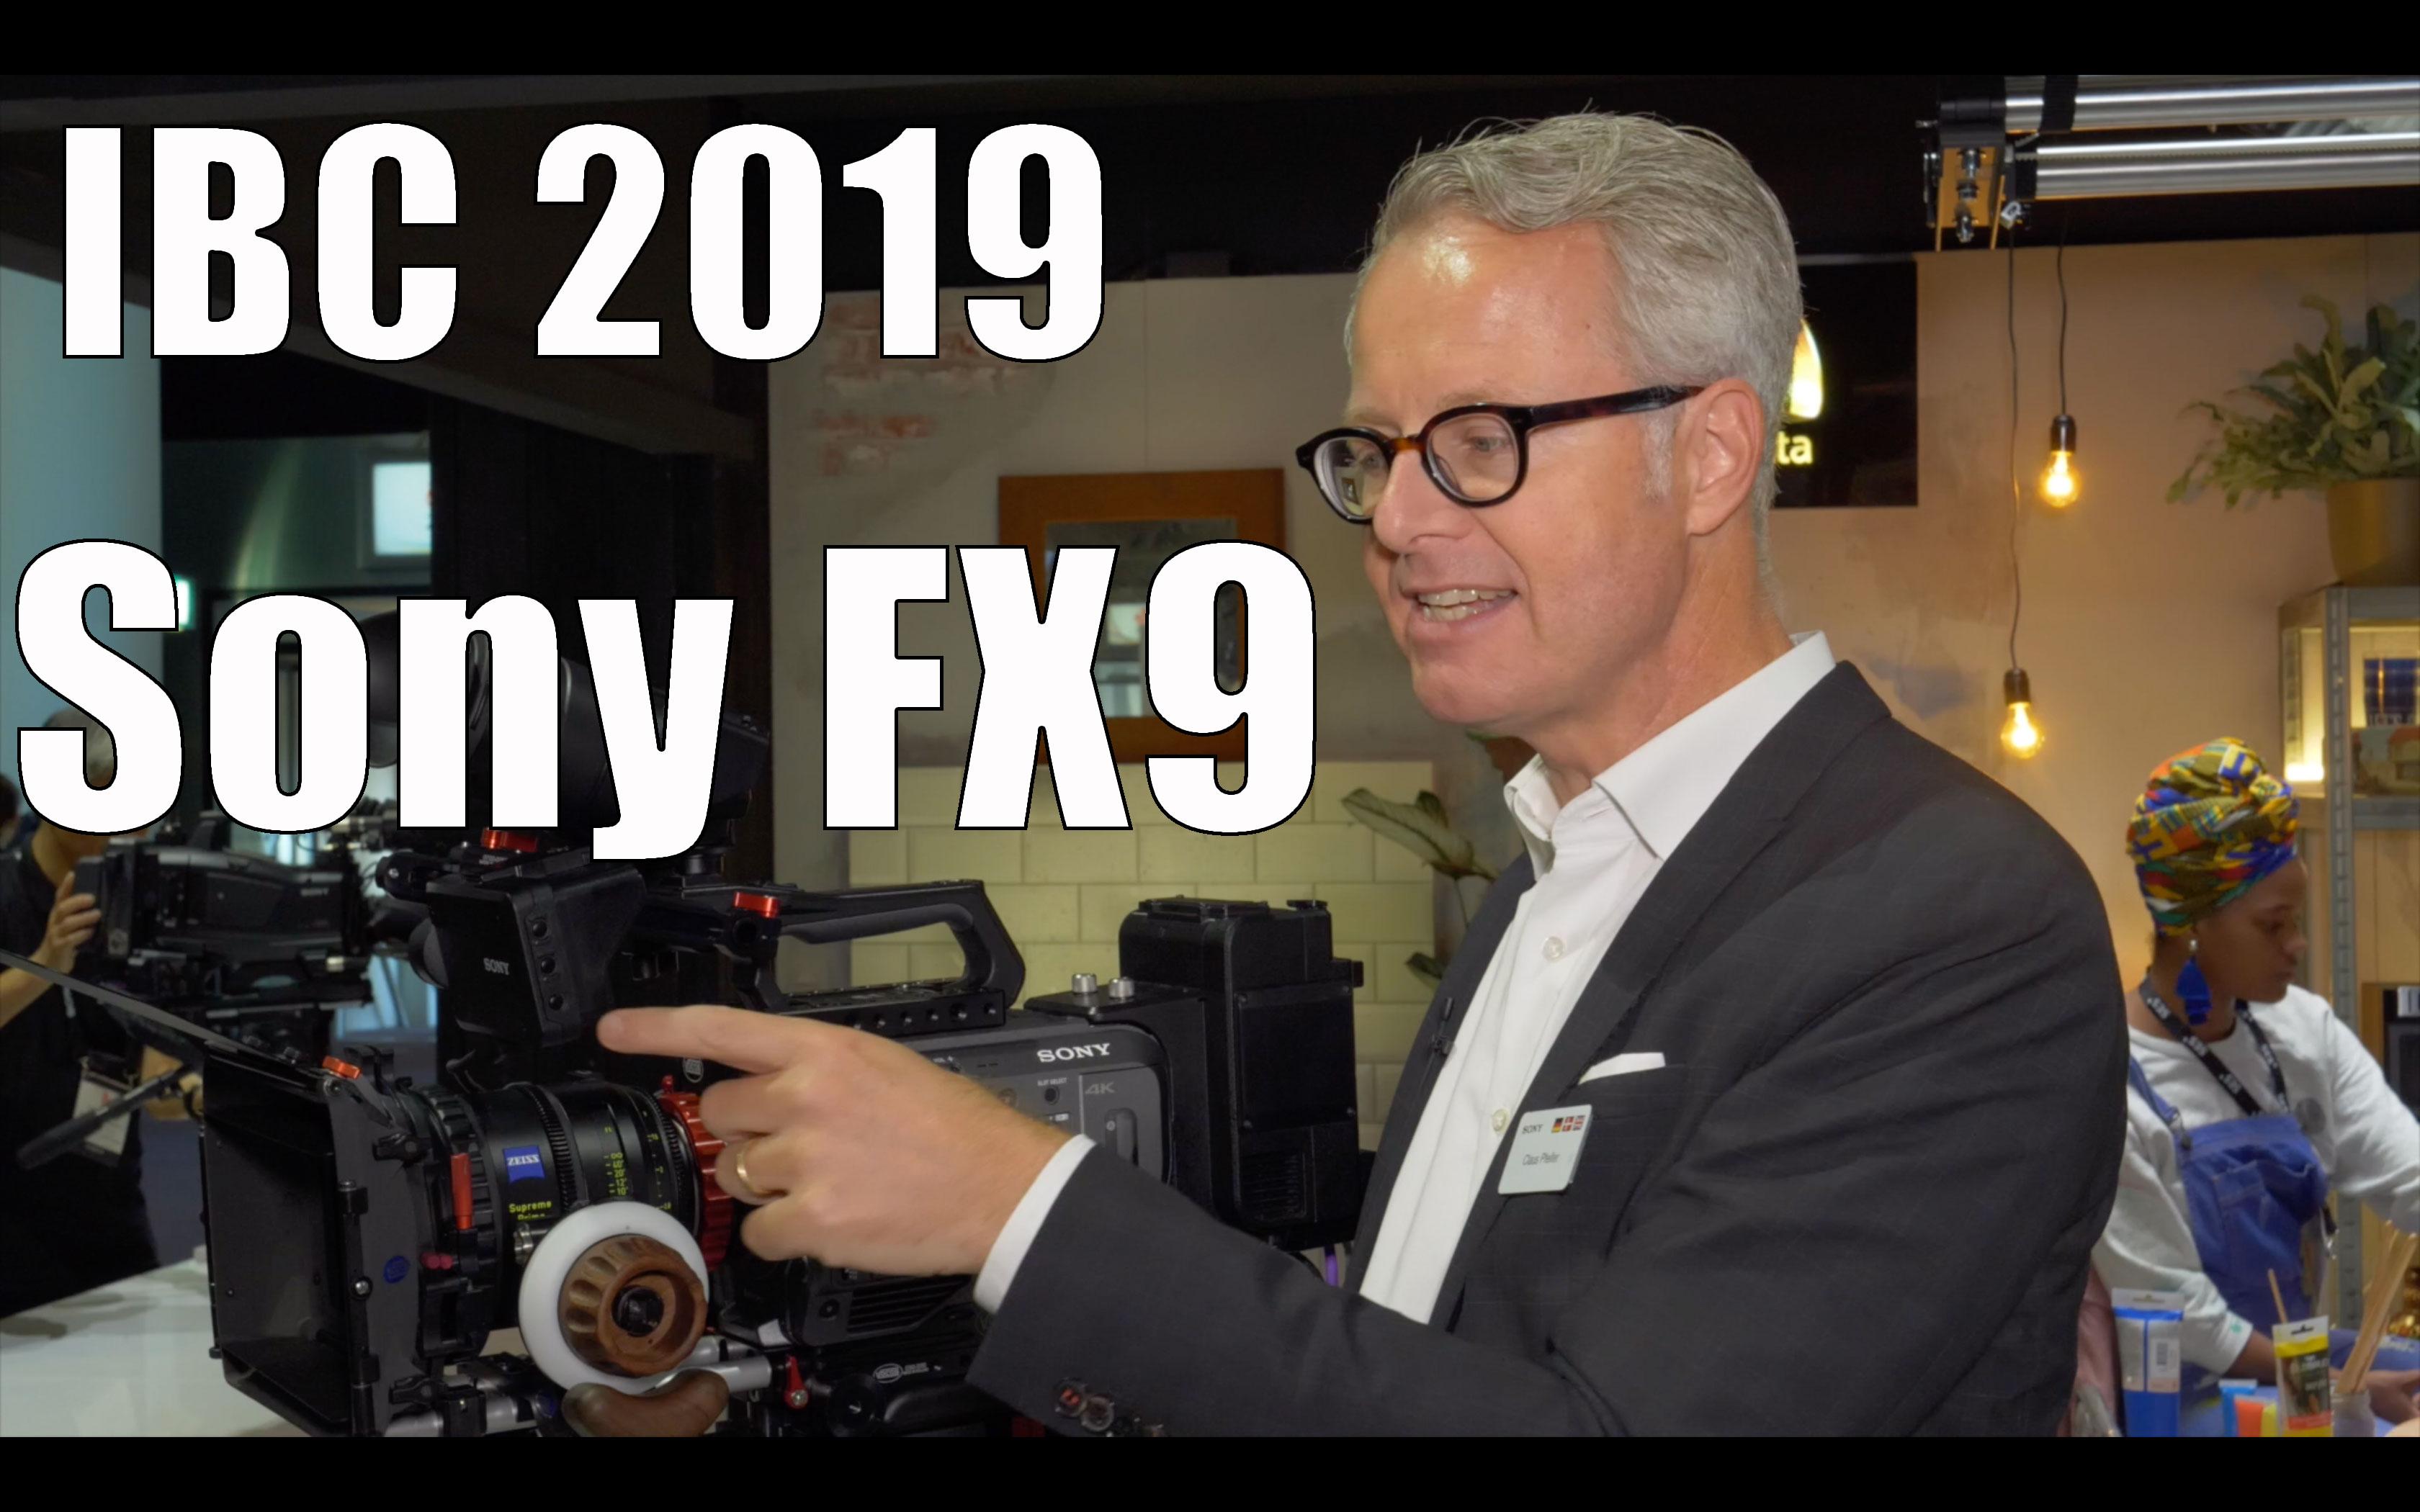 Sony FX9: Recording formats, ergonomics, autofocus, extension units, etc. // IBC 2019